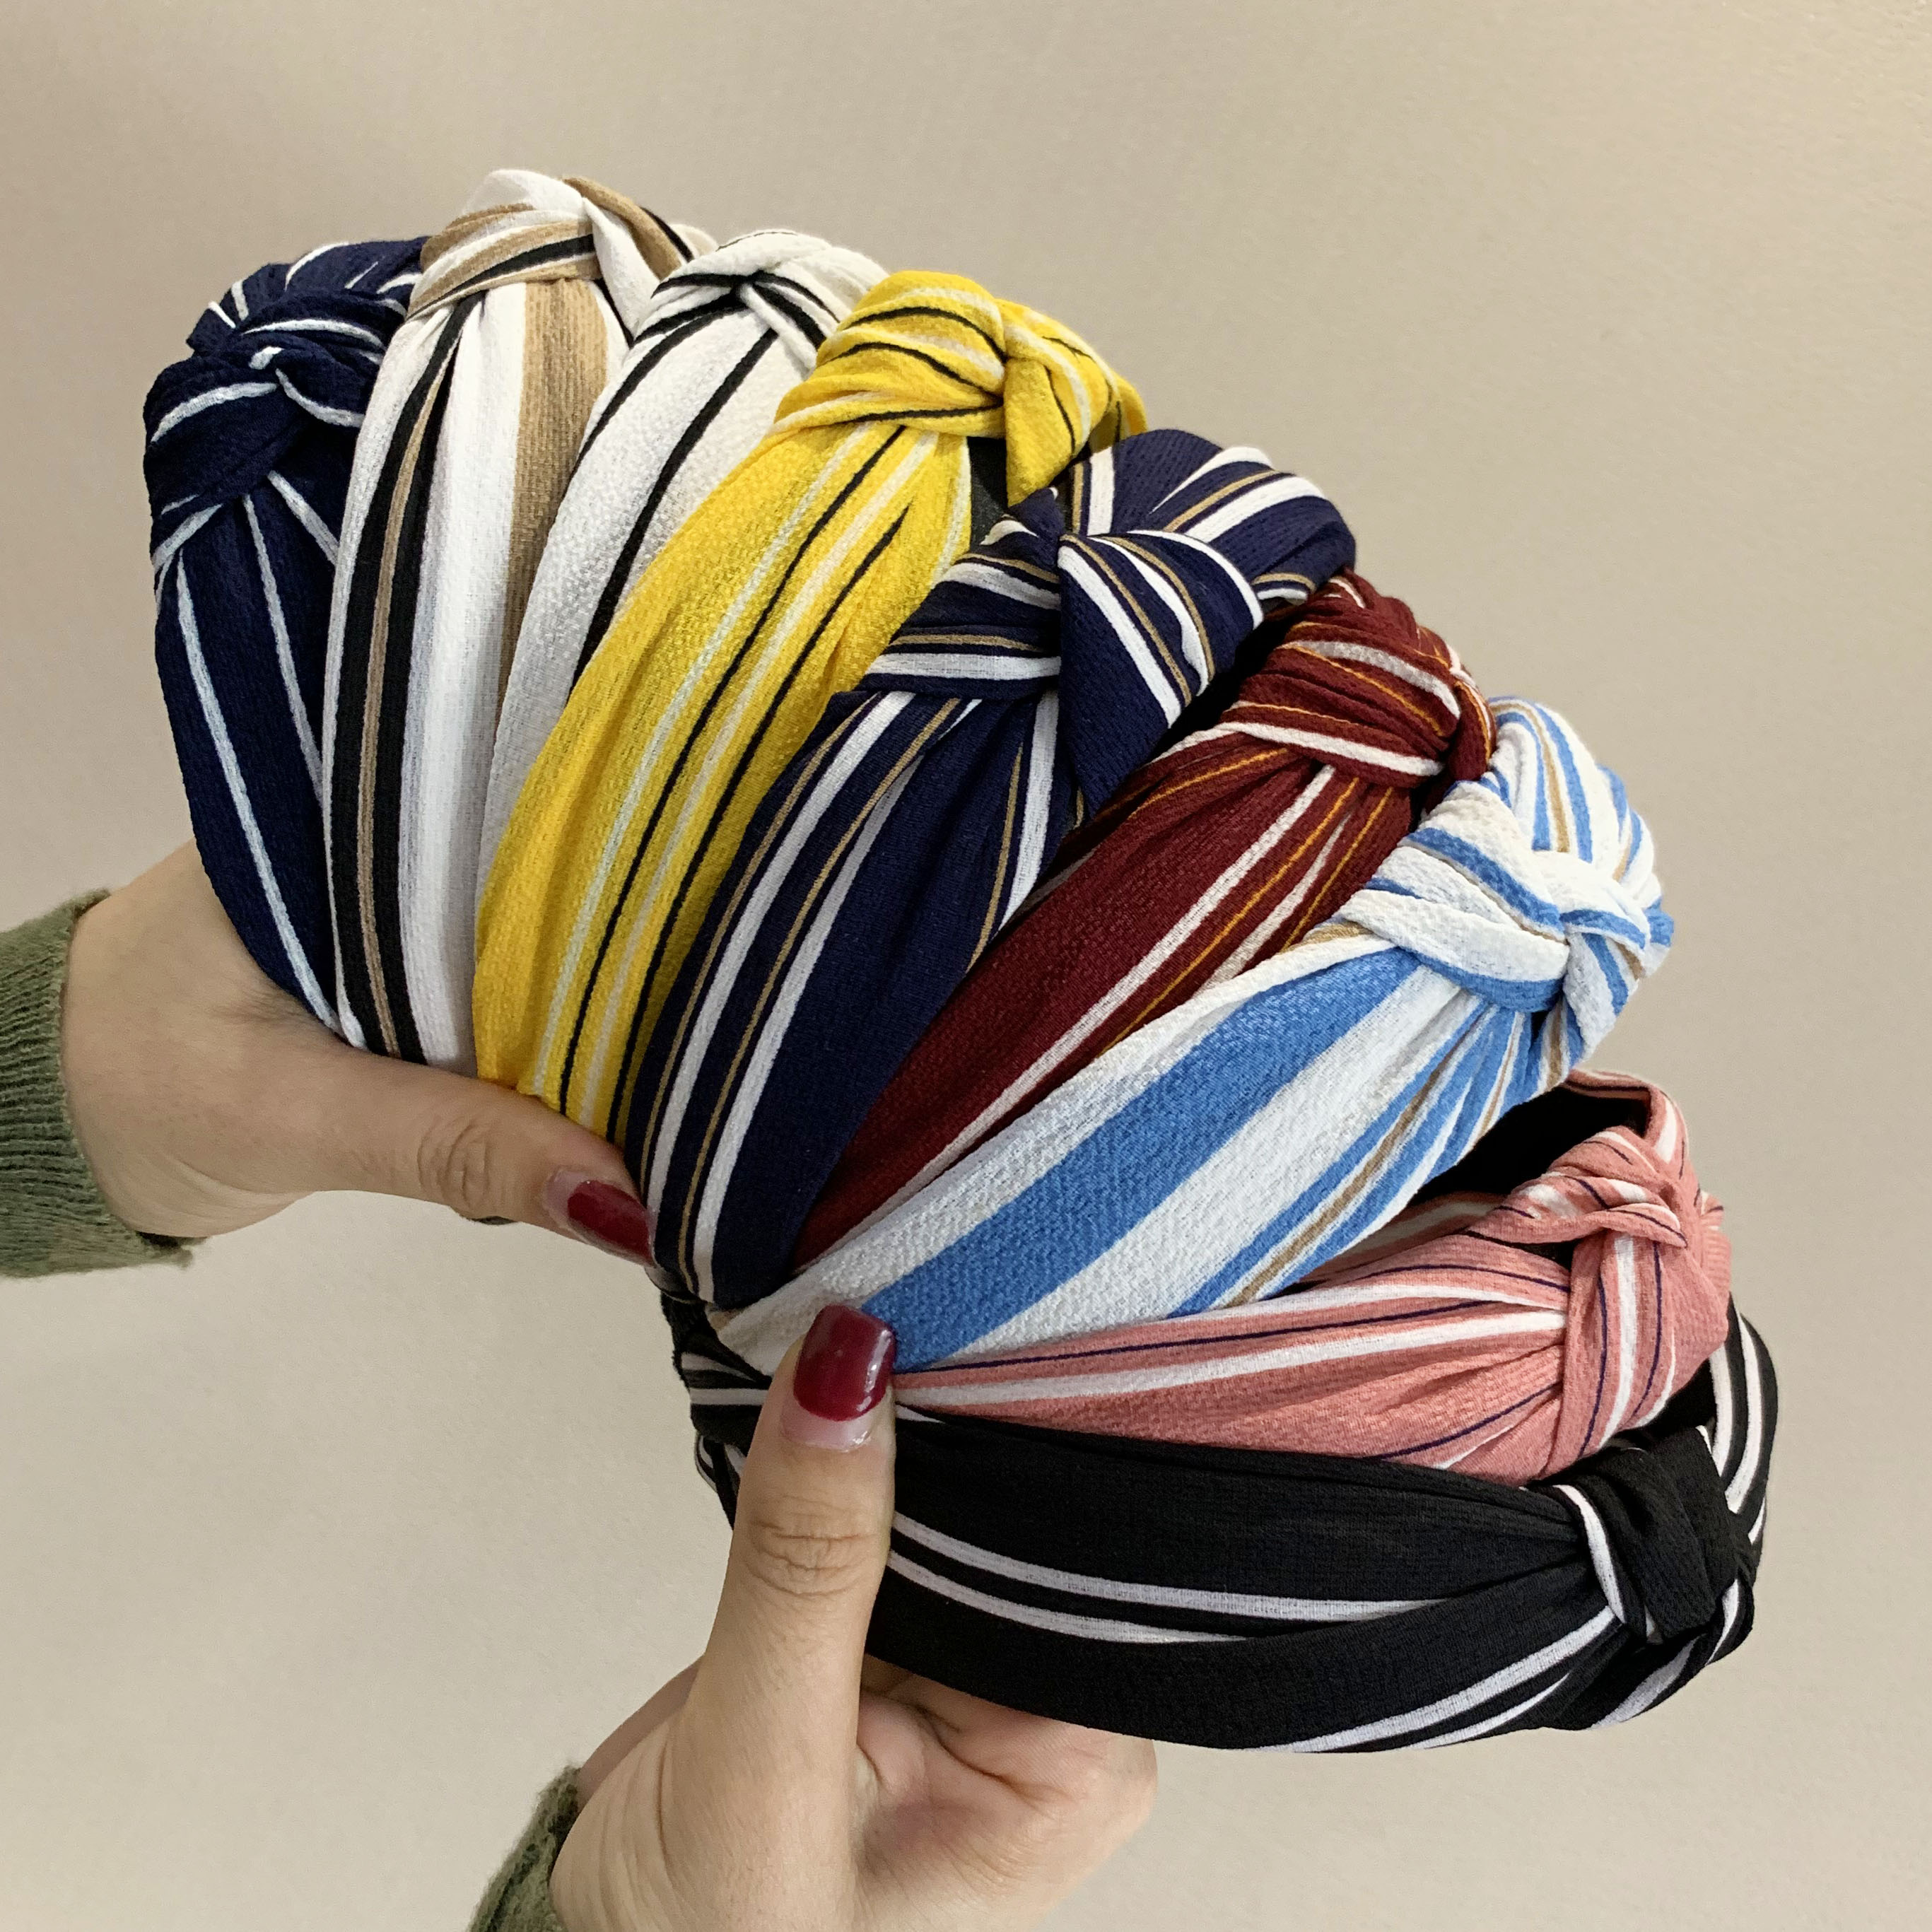 Chen Yan  New Stripe Headband Fashion Chiffon Headbands Knot Cross Hairband FG7